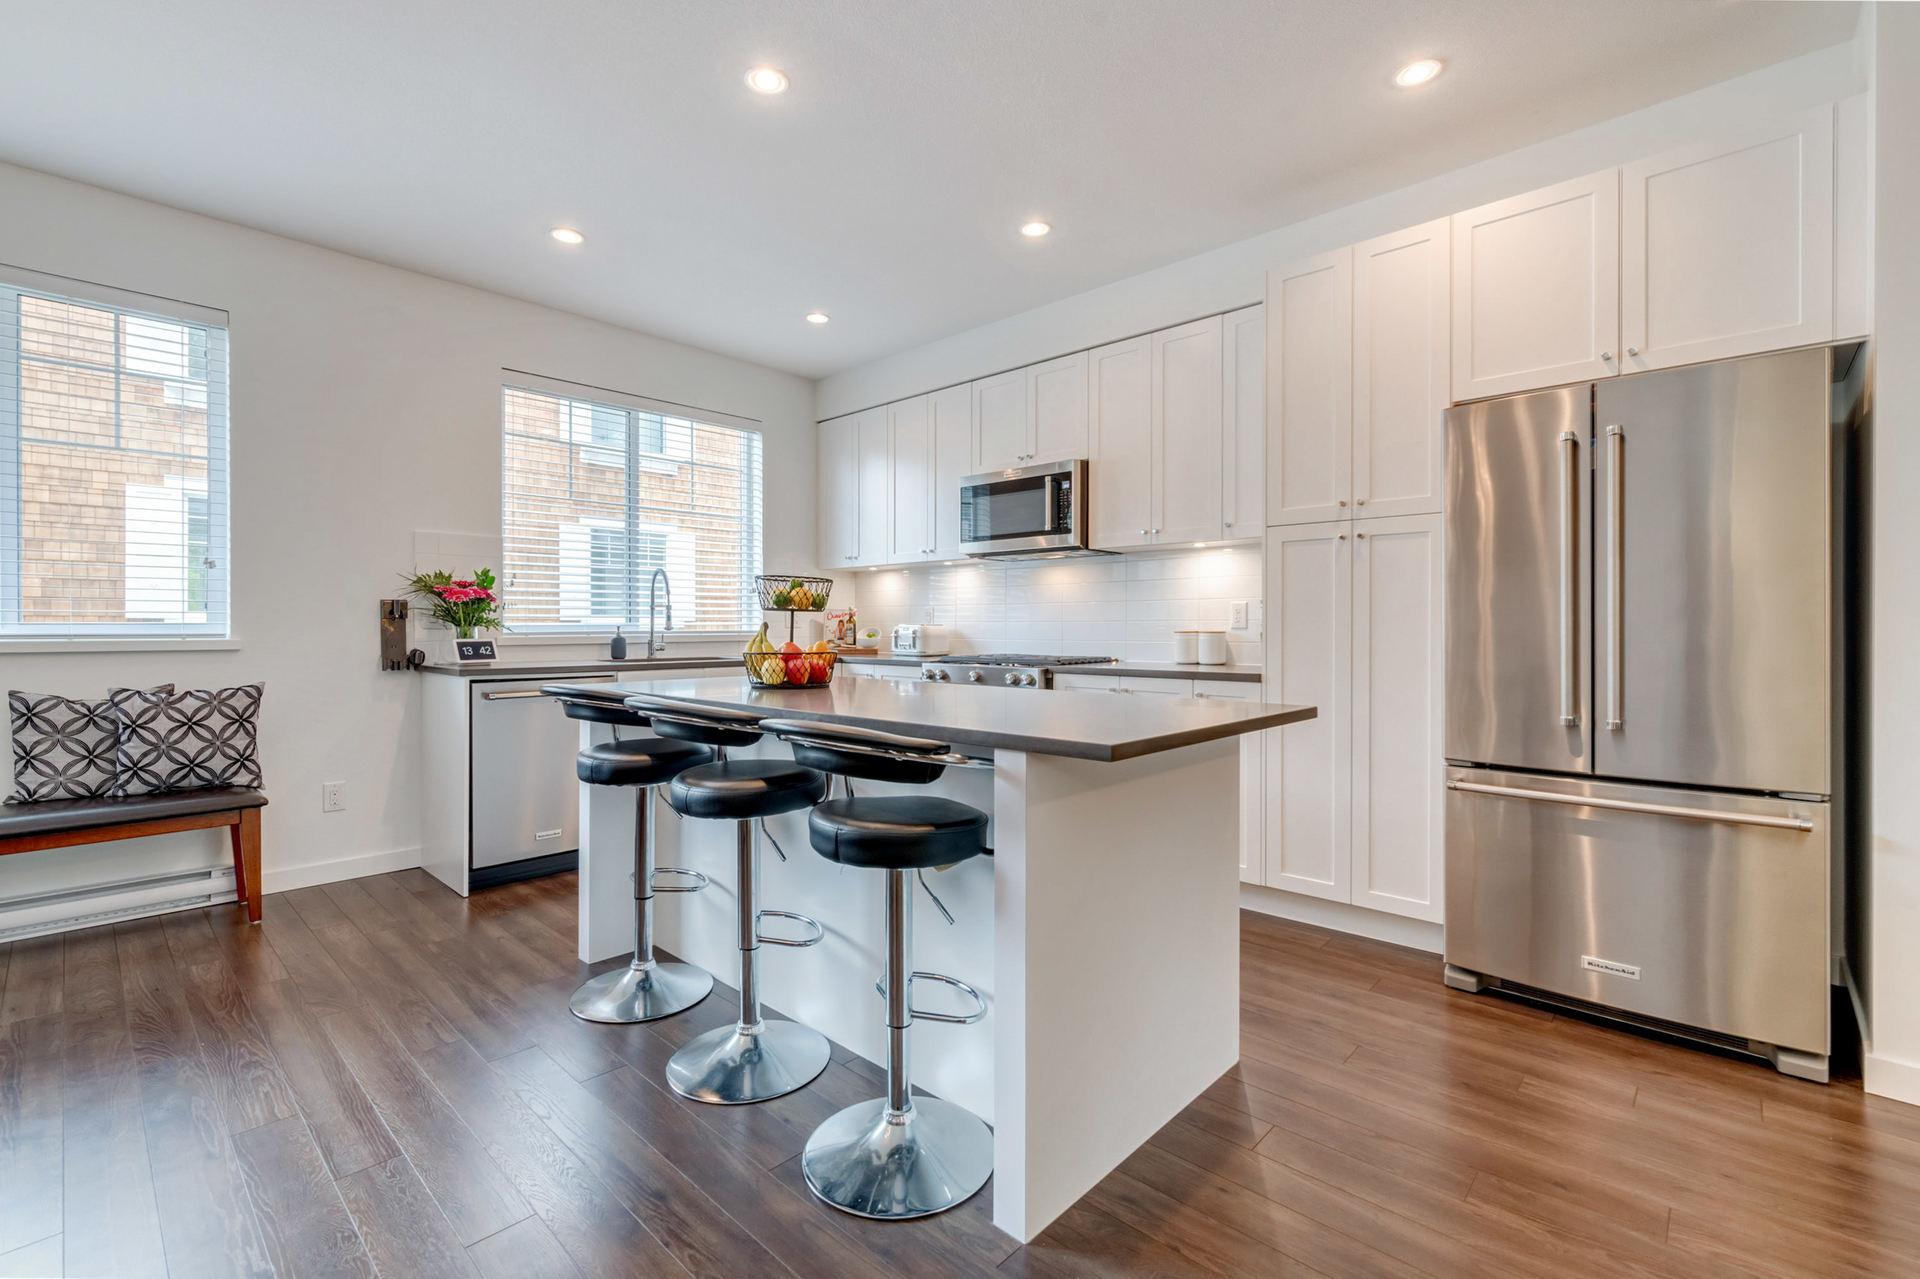 Kitchen  at 22 - 127 172 Street, Pacific Douglas, South Surrey White Rock